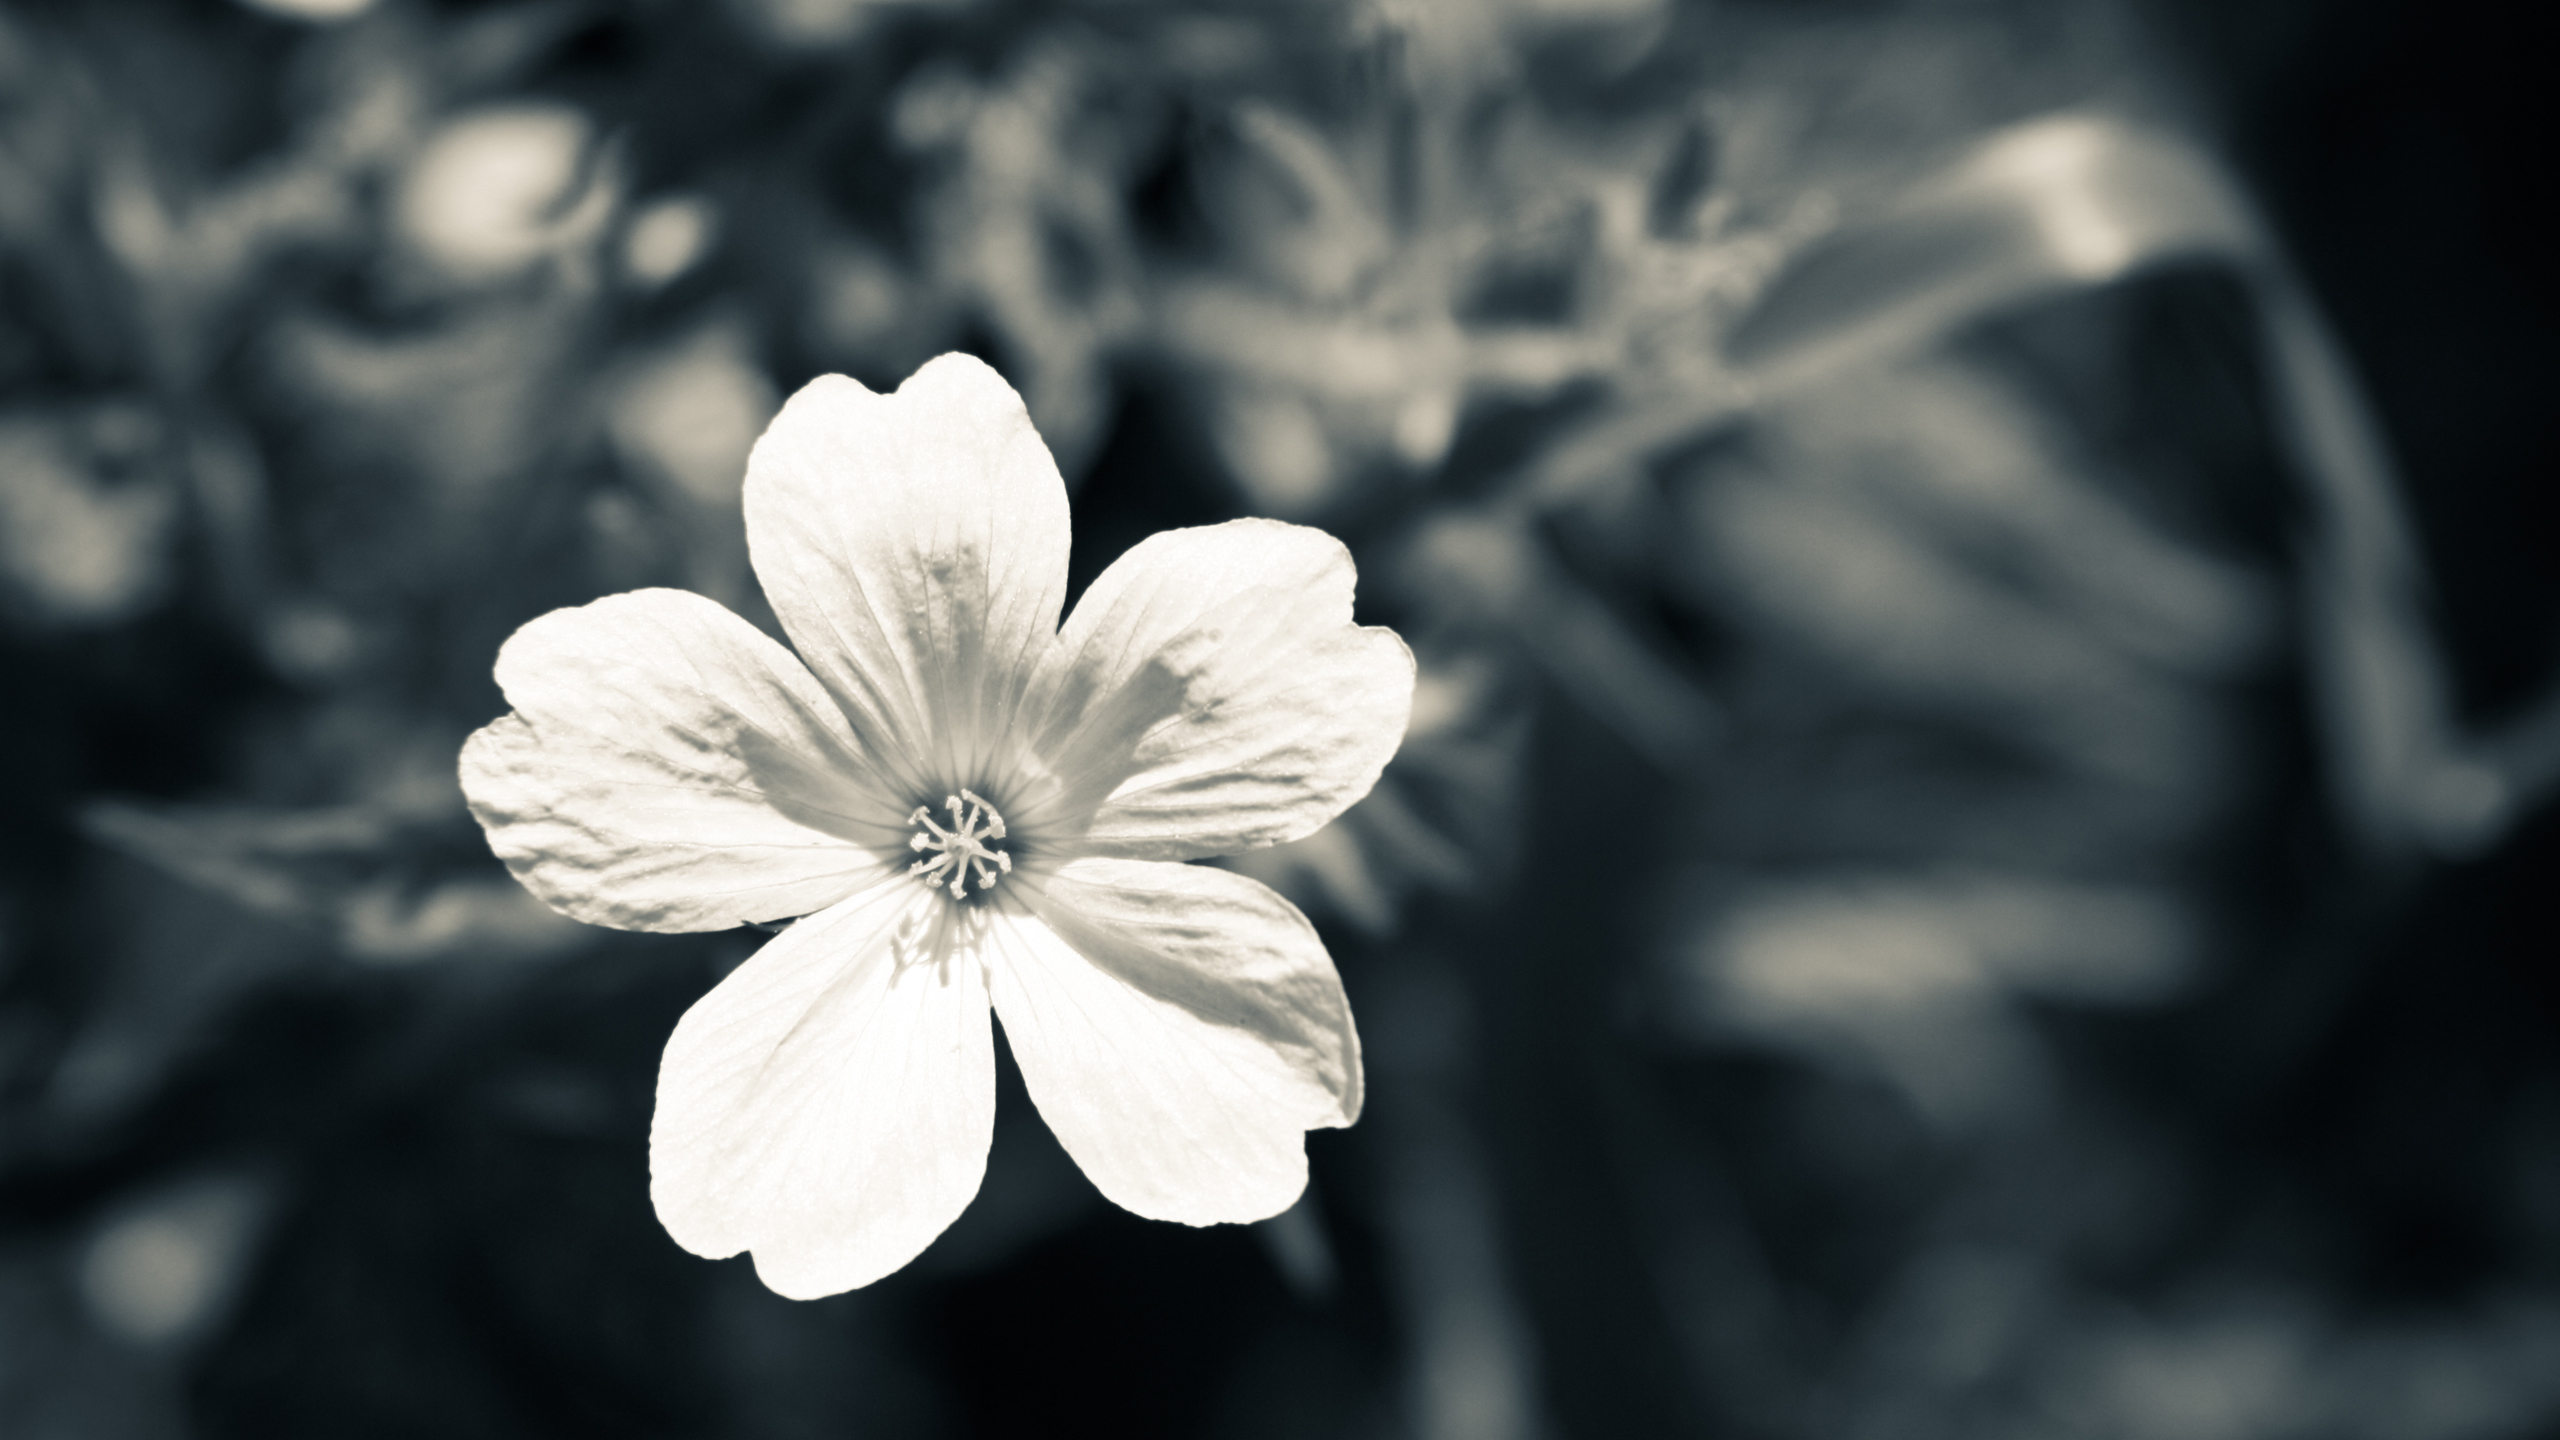 black and white flower iphone wallpaper walljpegcom 2560x1440